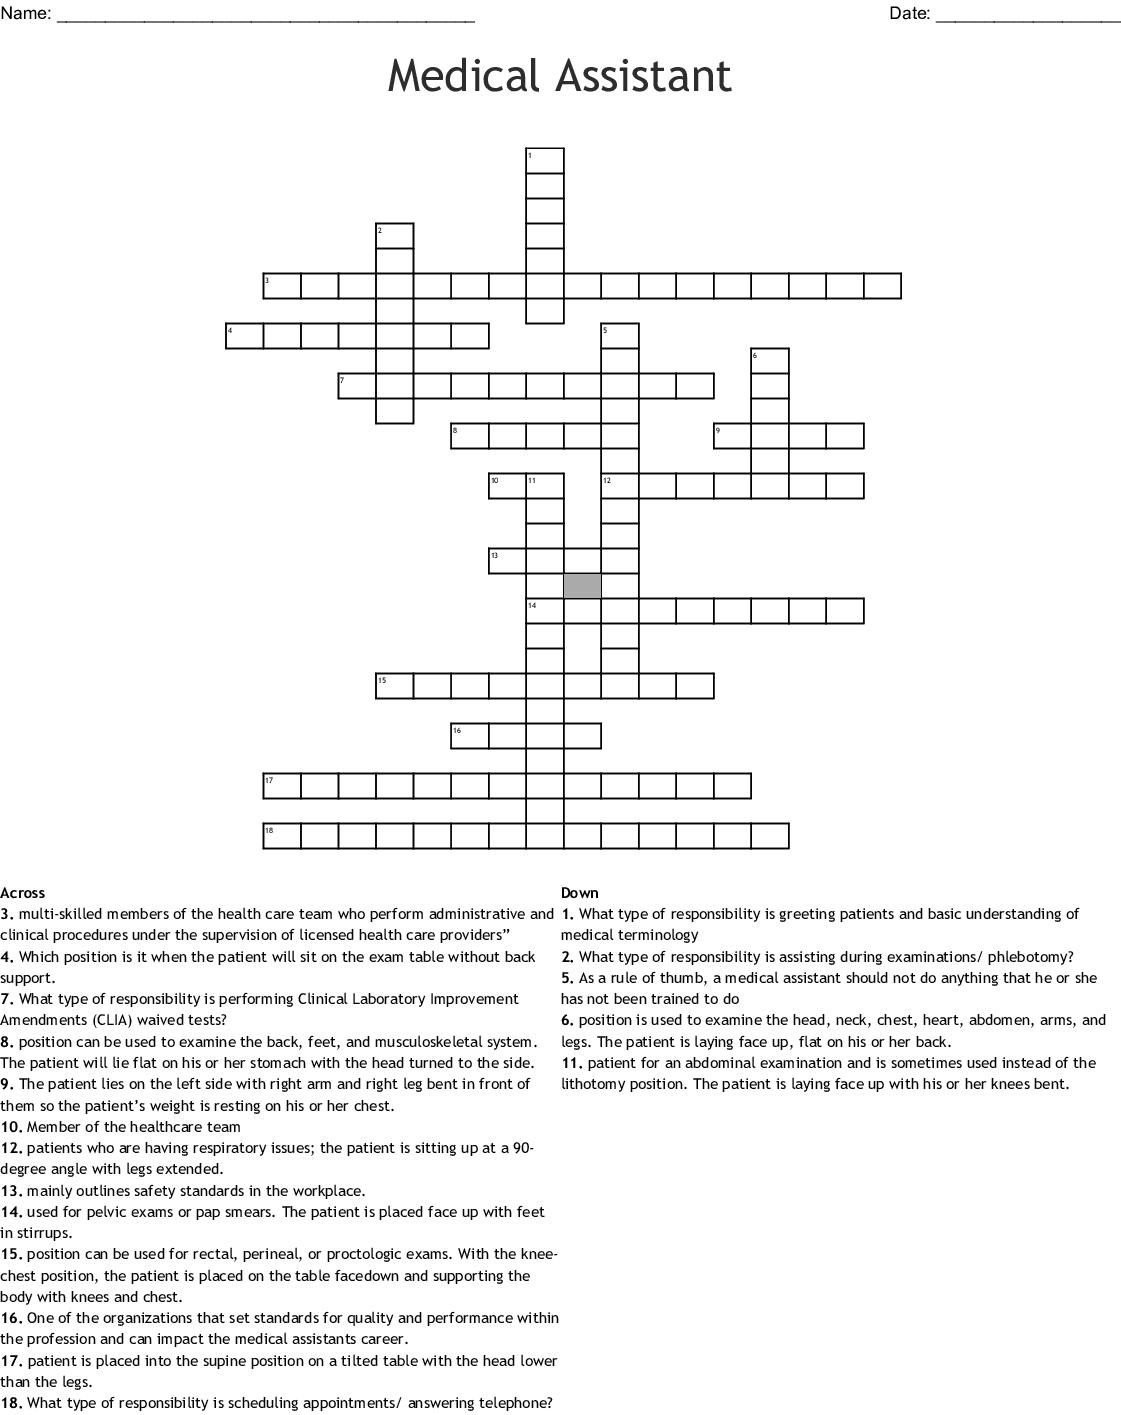 Health Education Amp Medical Training Crosswords Word